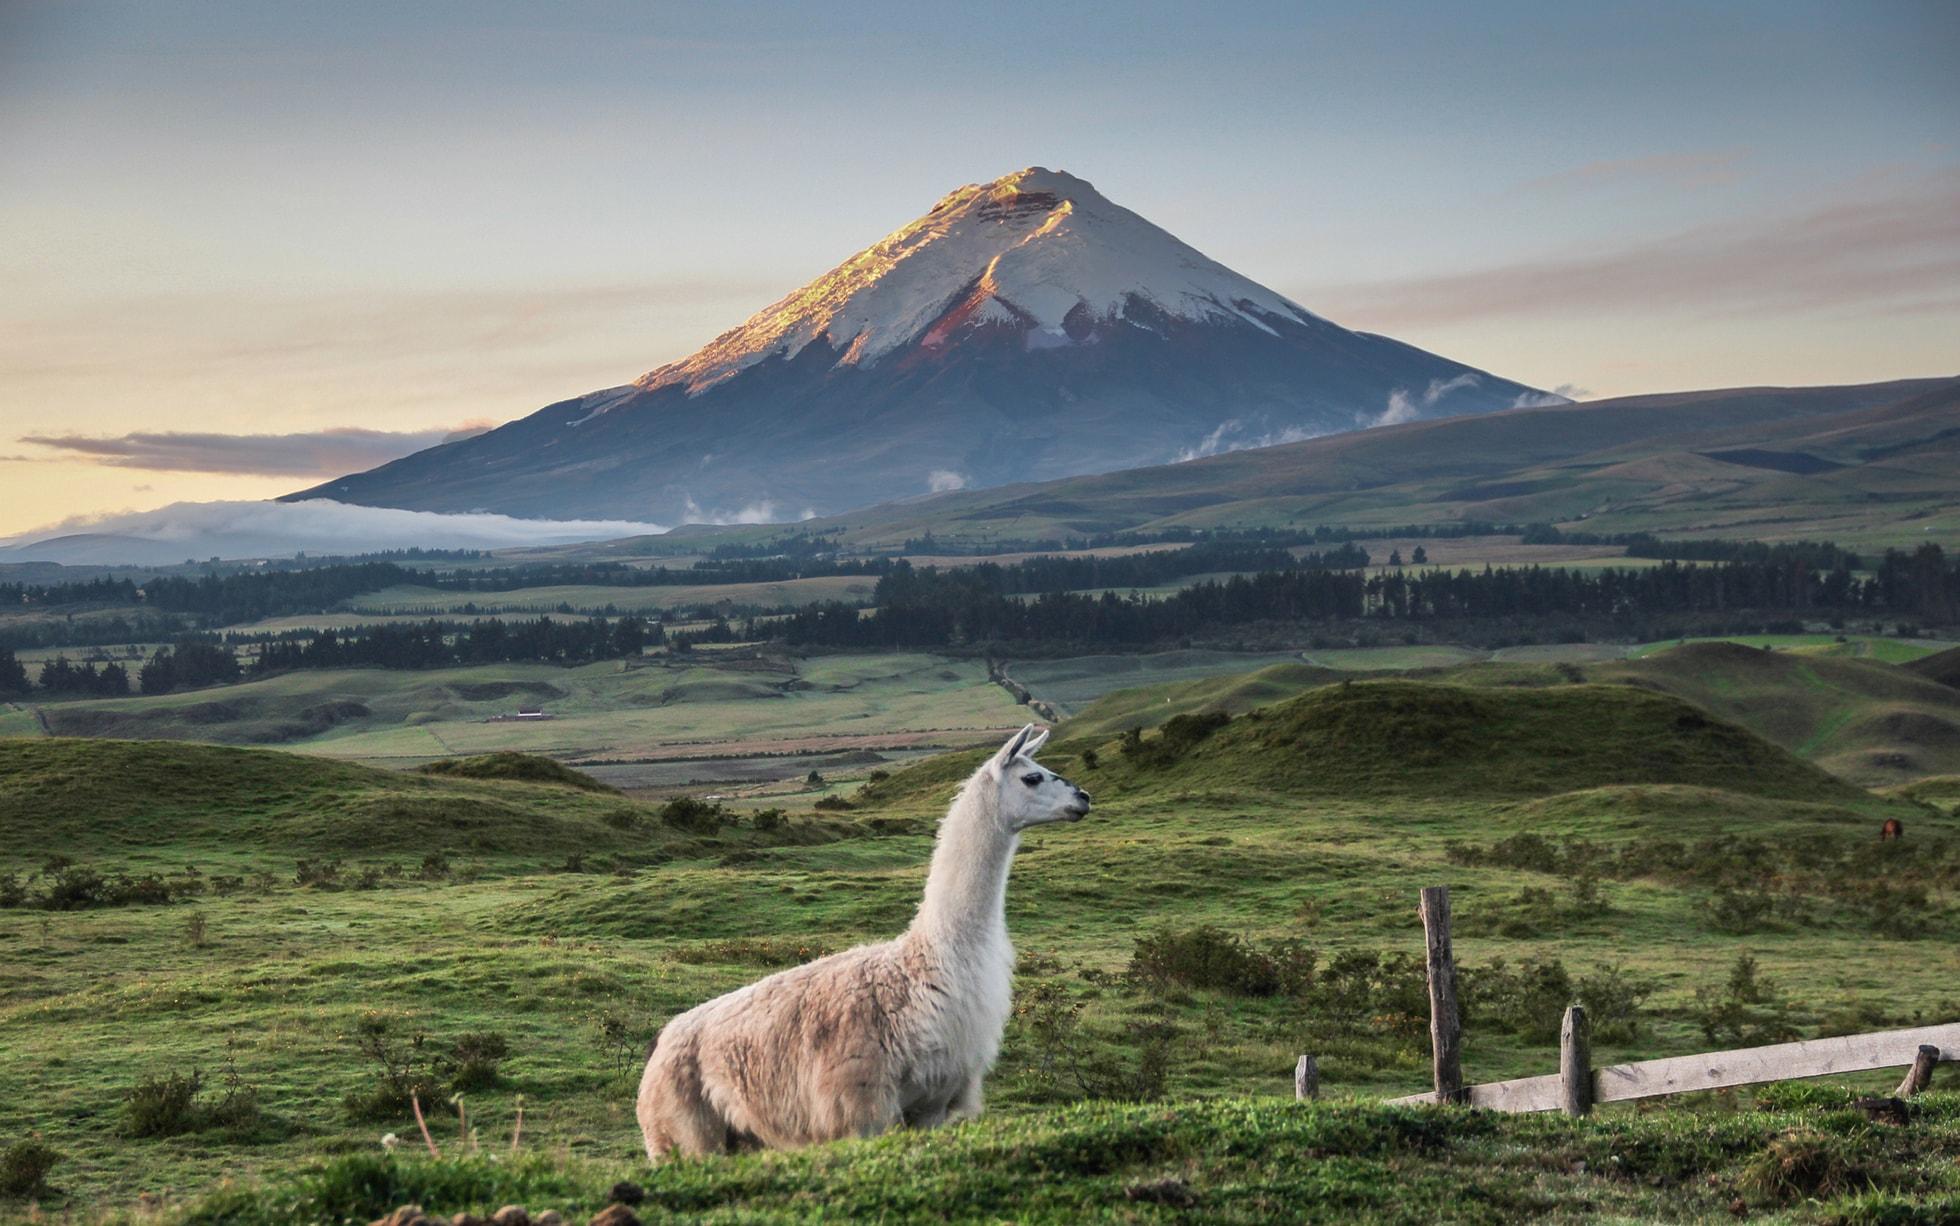 Thiên nhiên Ecuador